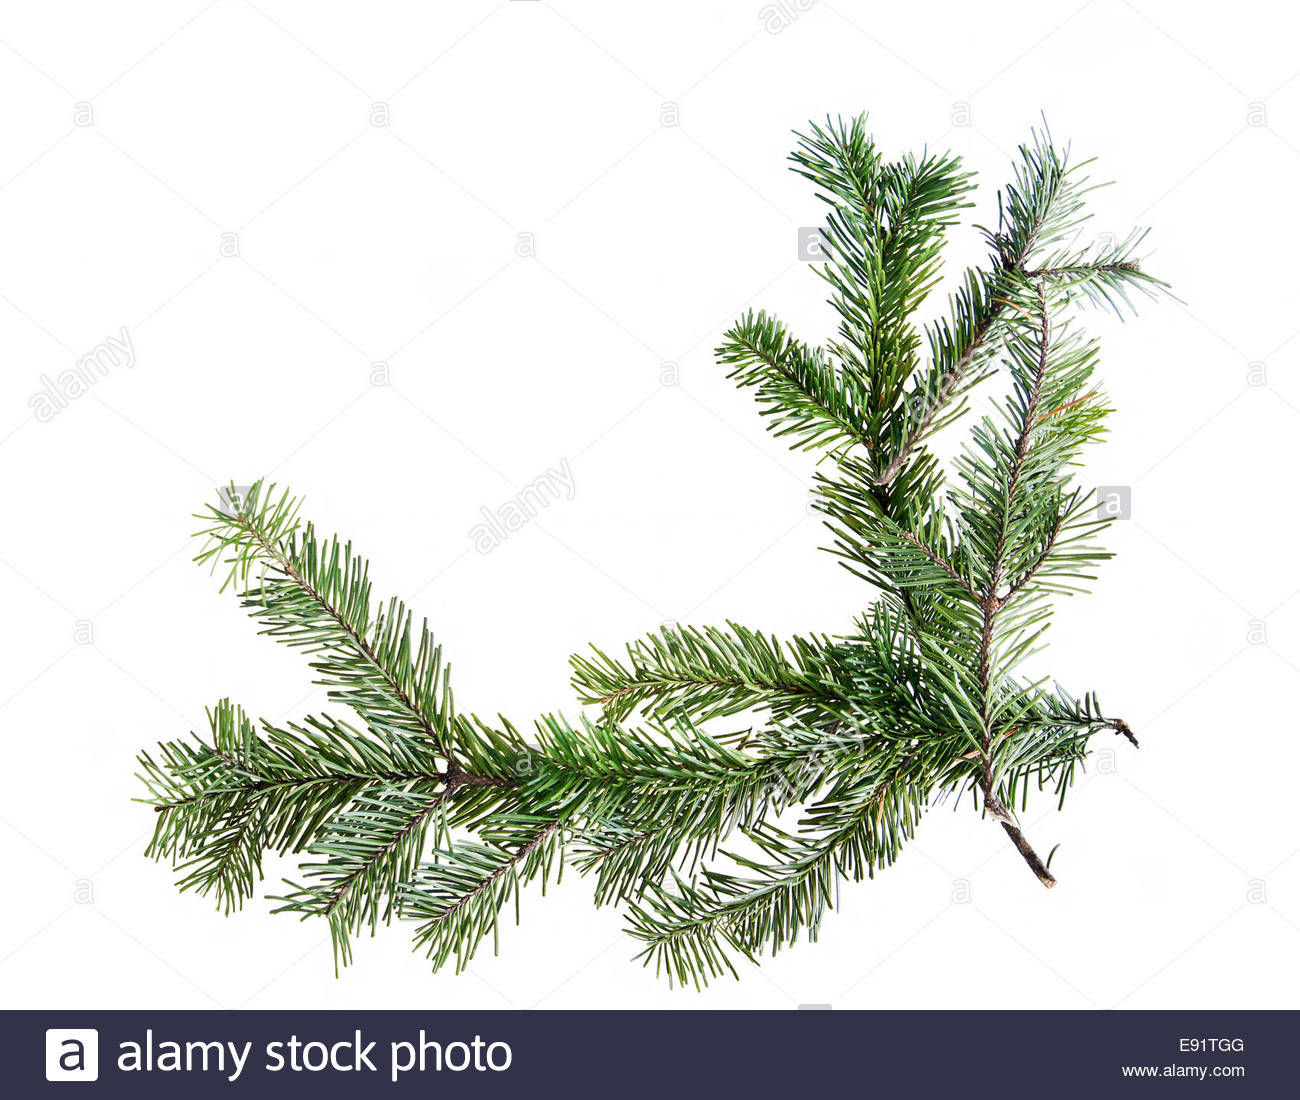 Design element.  Corner of spruce branches - Stock Image